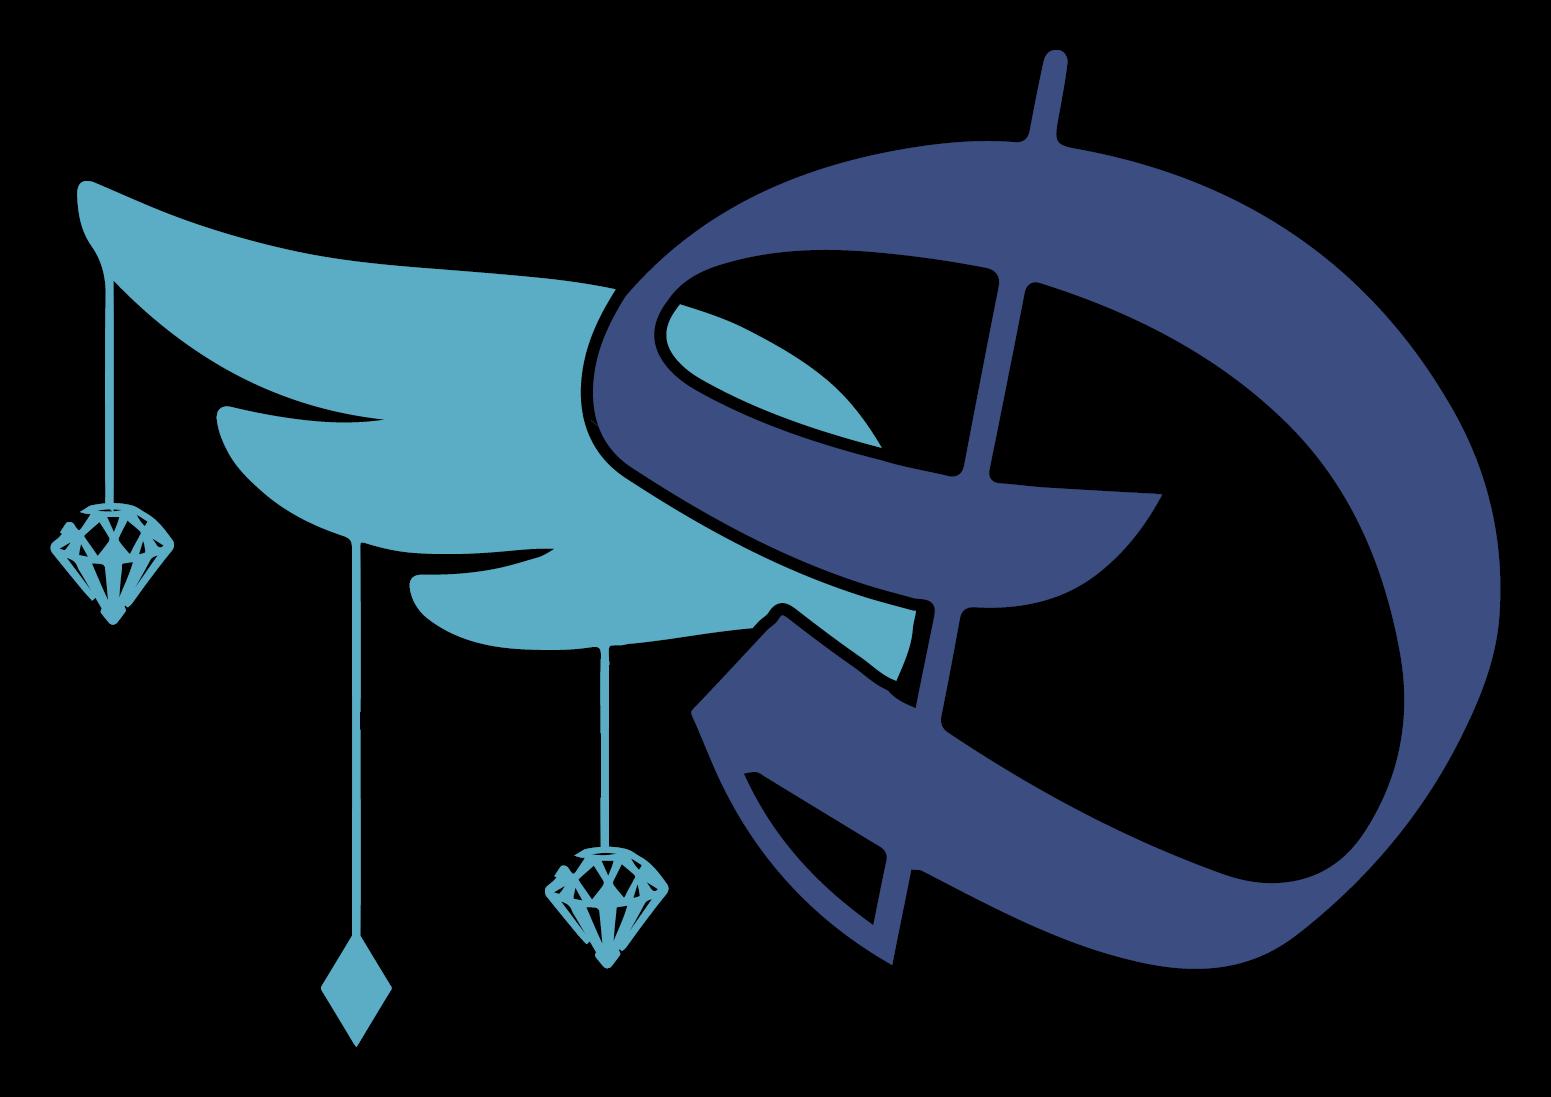 Craft studios deviantart welcome. Teamwork clipart doodle